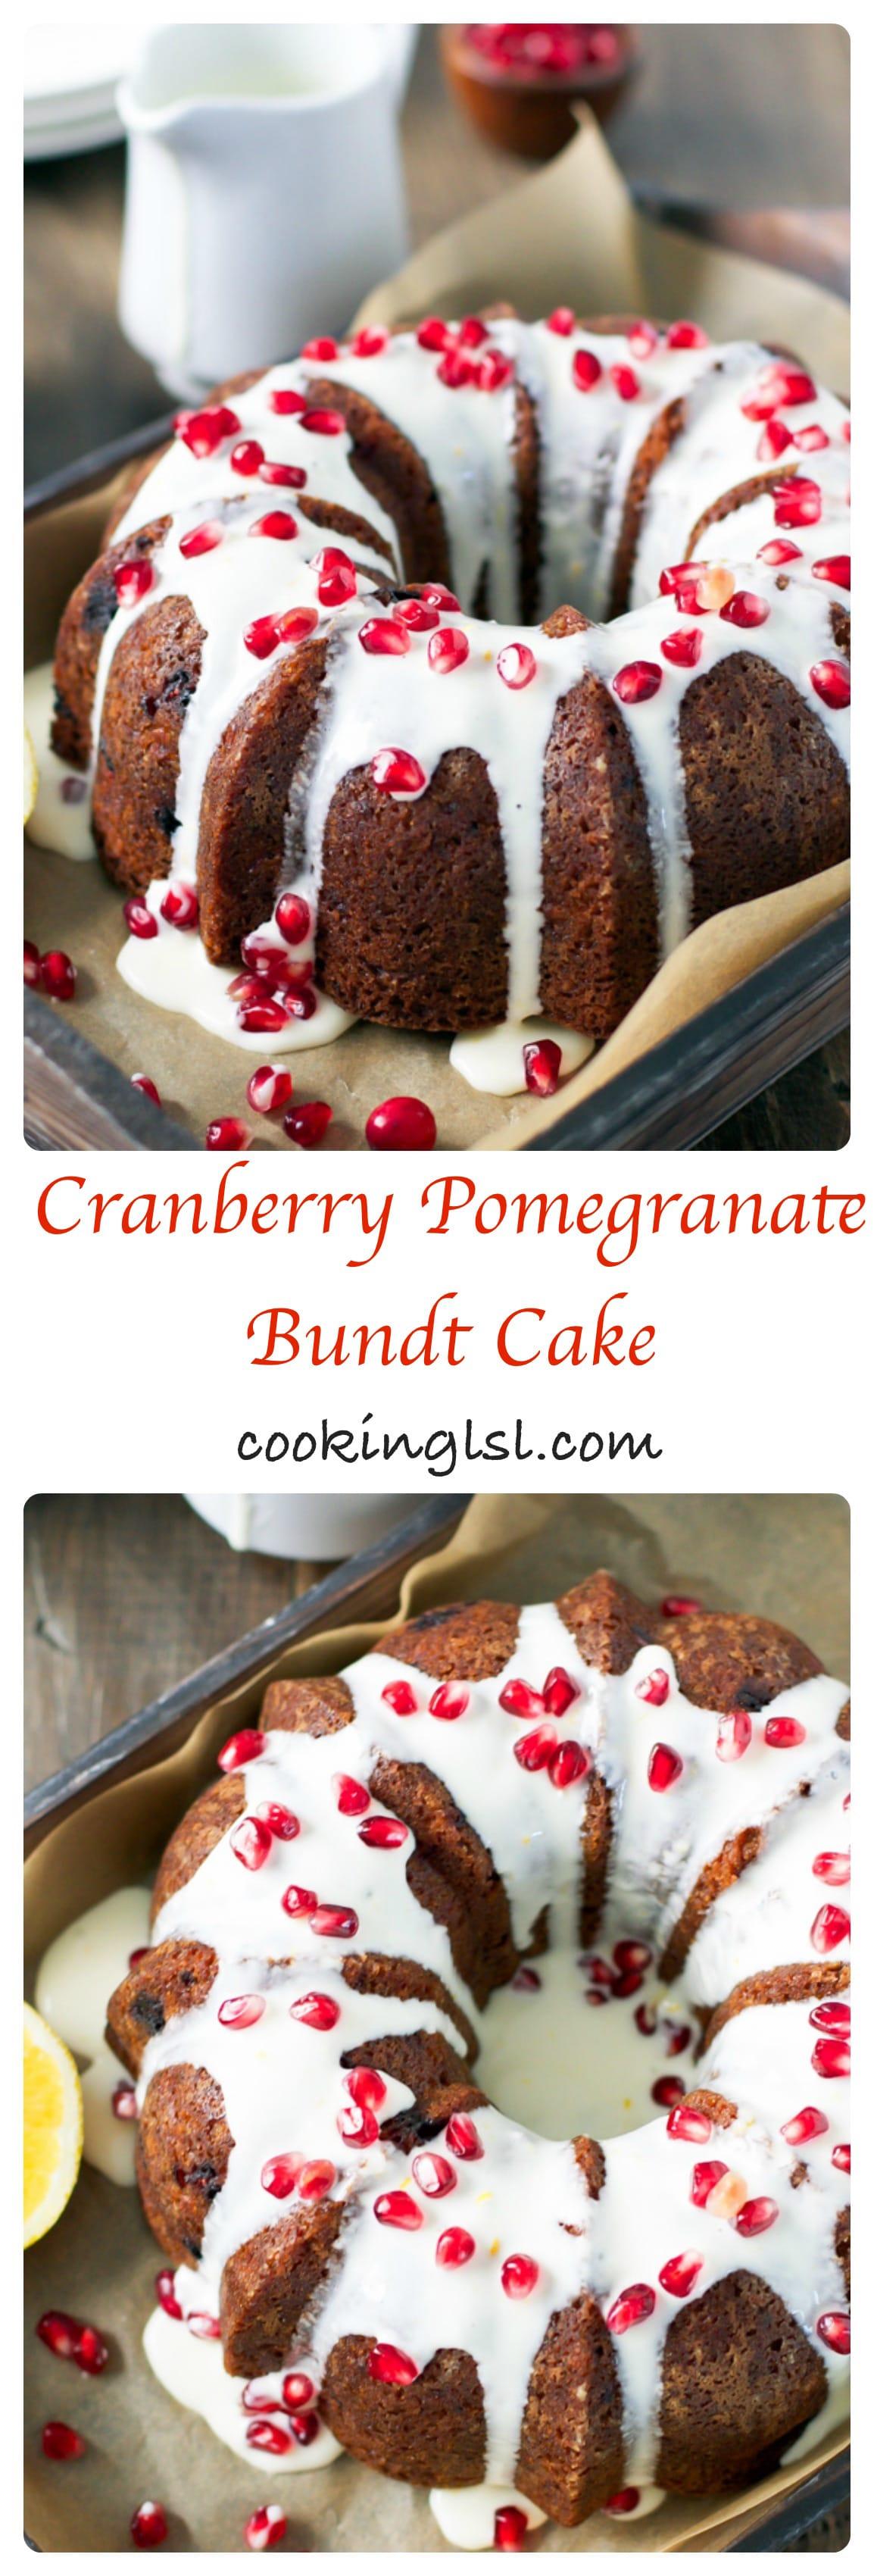 Cranberry-Pomegranate-Pound-Cake- With-Orange-Cream-Cheese-Glaze-Recipe